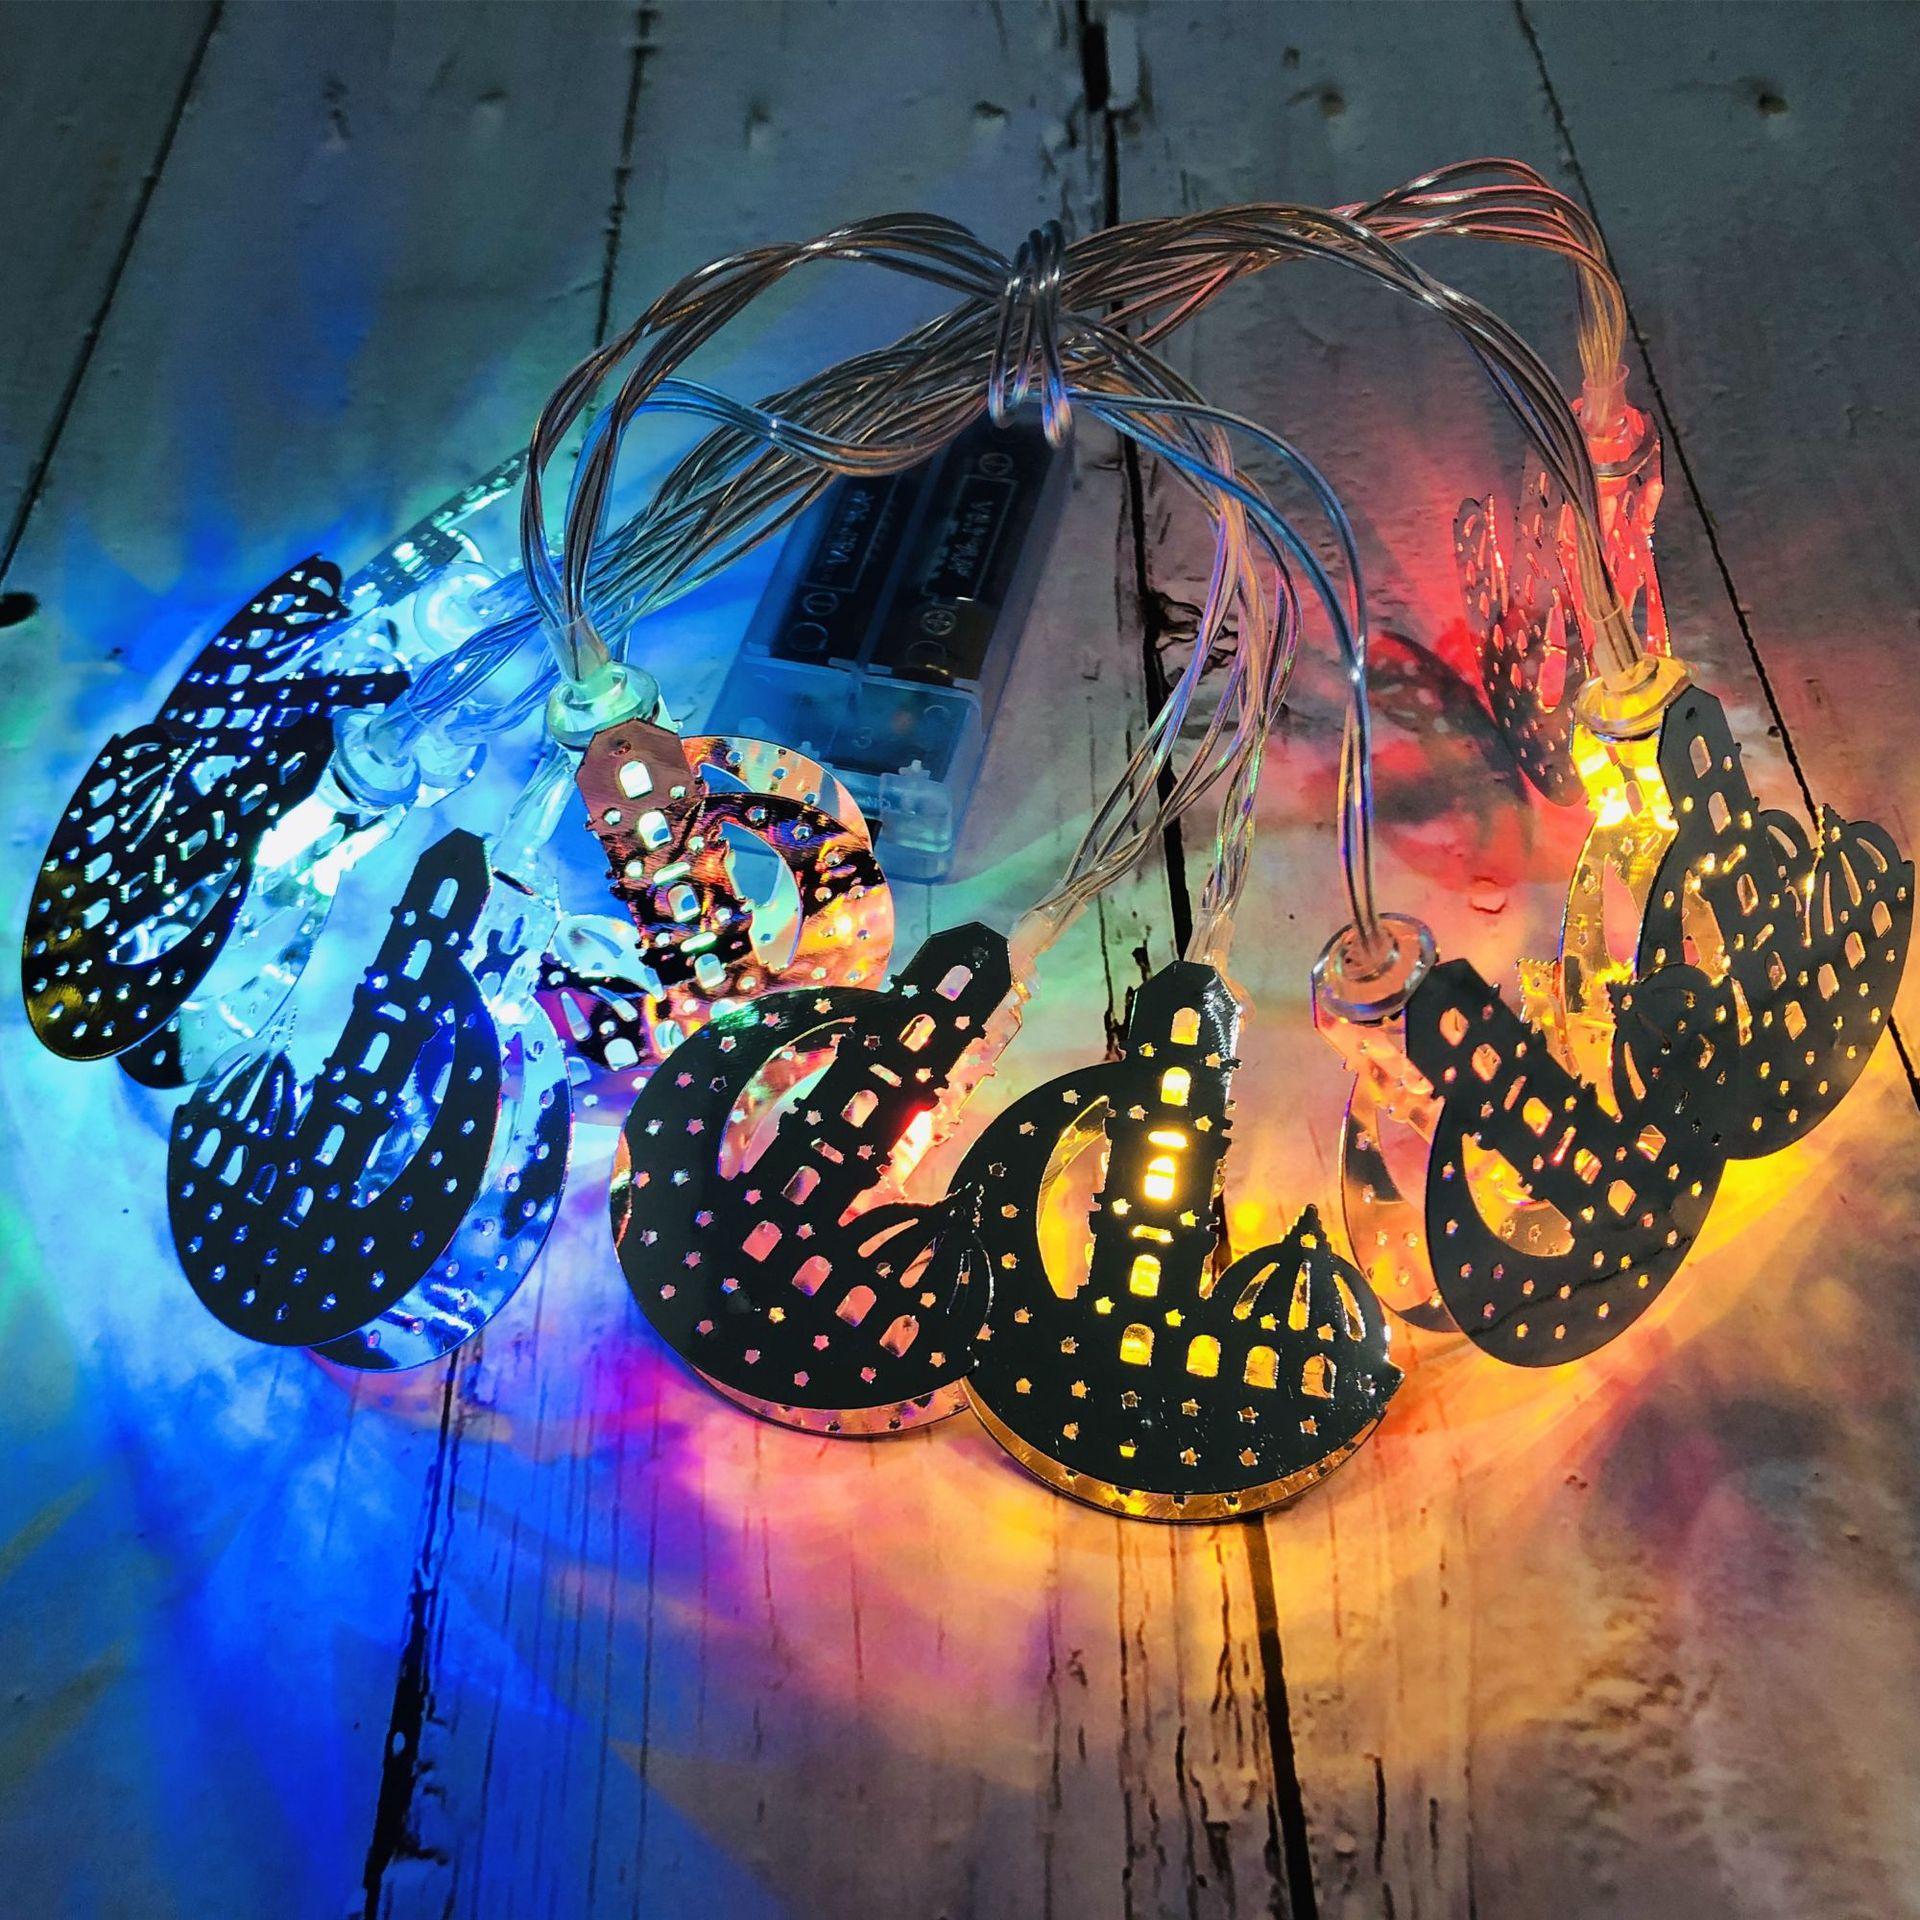 Eid Mubarak LED Wrought Iron Moon Castle Light String Ramadan Festival Garden Holiday Party Decoration Silver Moon Castle-Four Colors